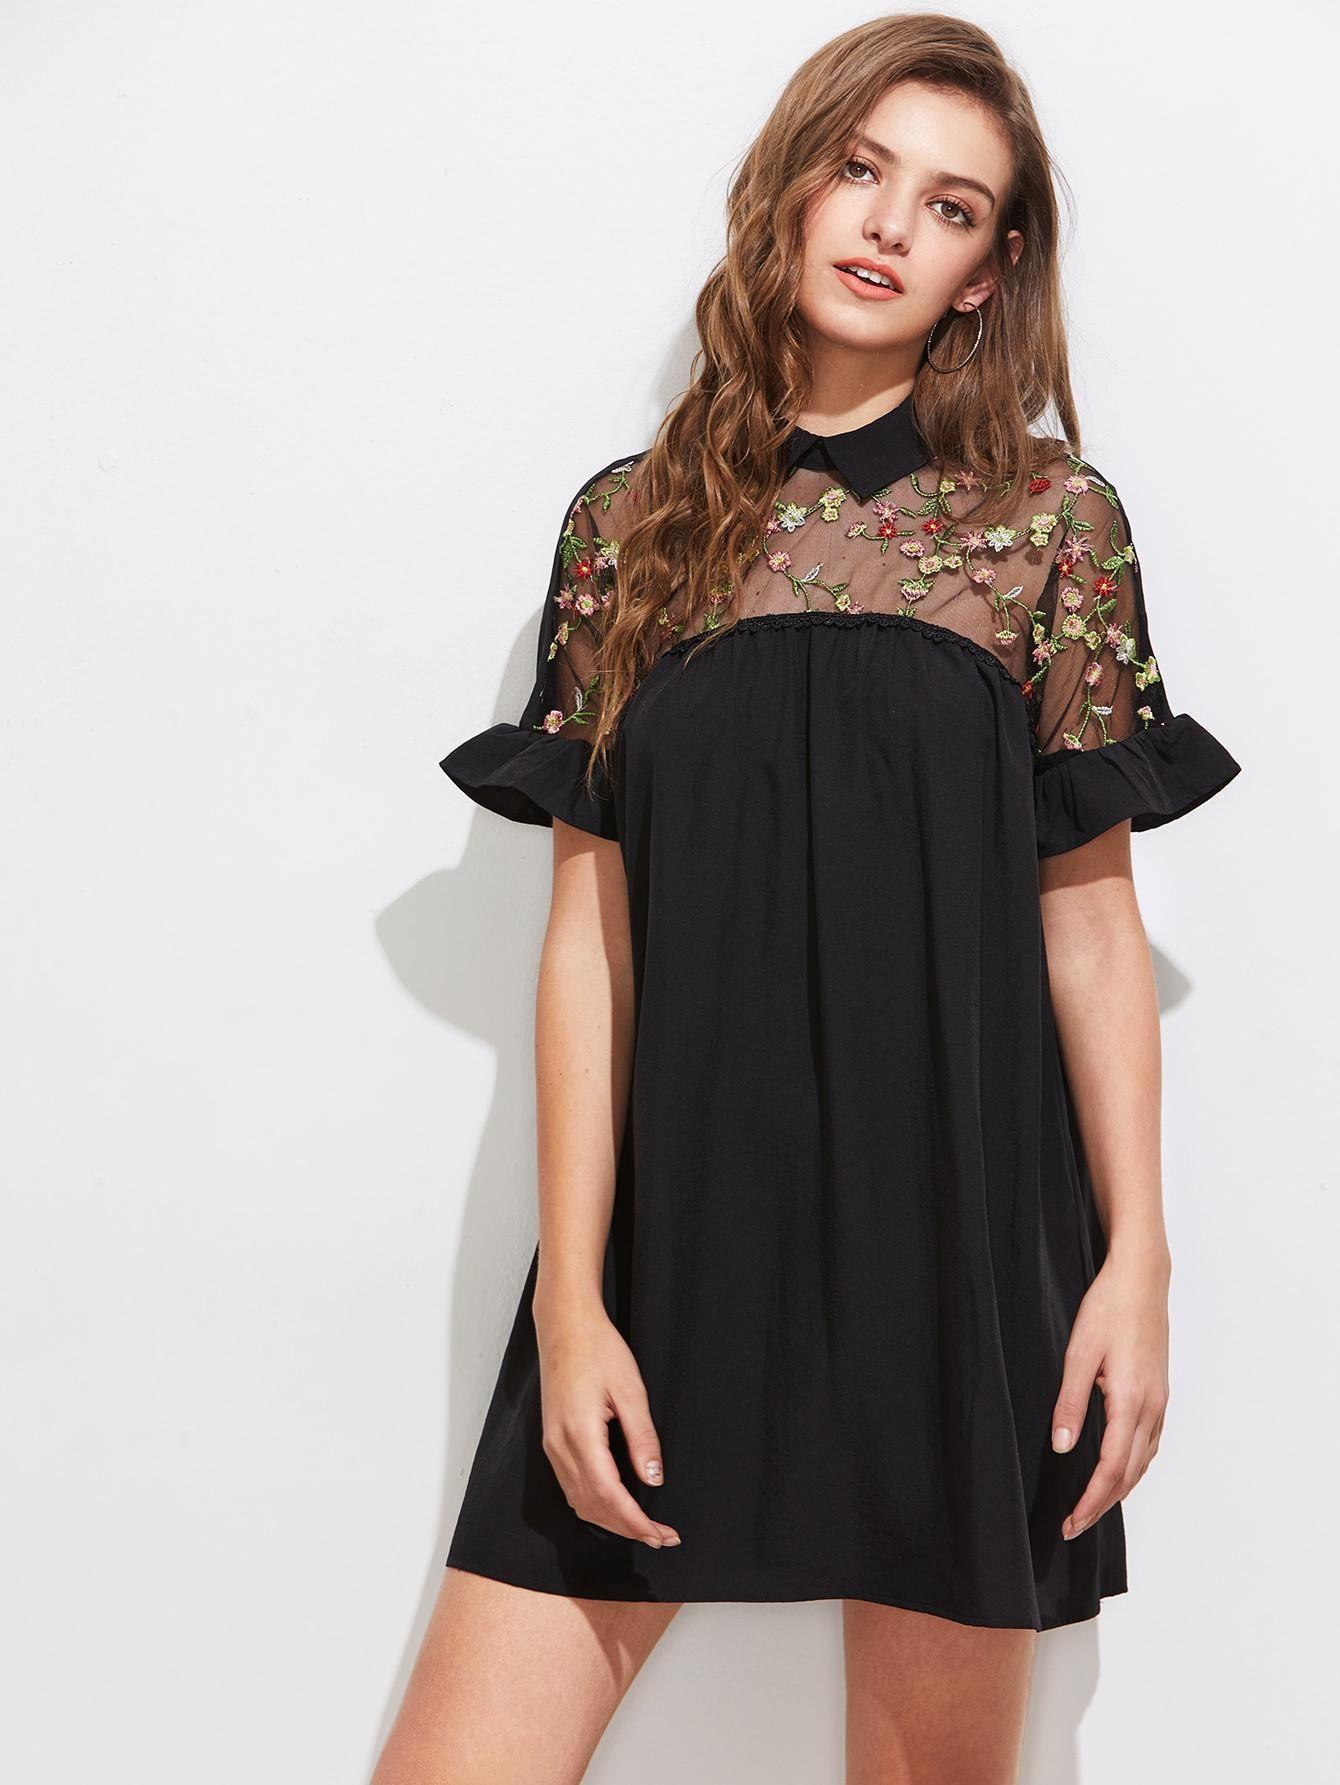 6c41fba3fc SheIn - SheIn Embroidered Sheer Mesh Insert Tie Back Dress - AdoreWe.com